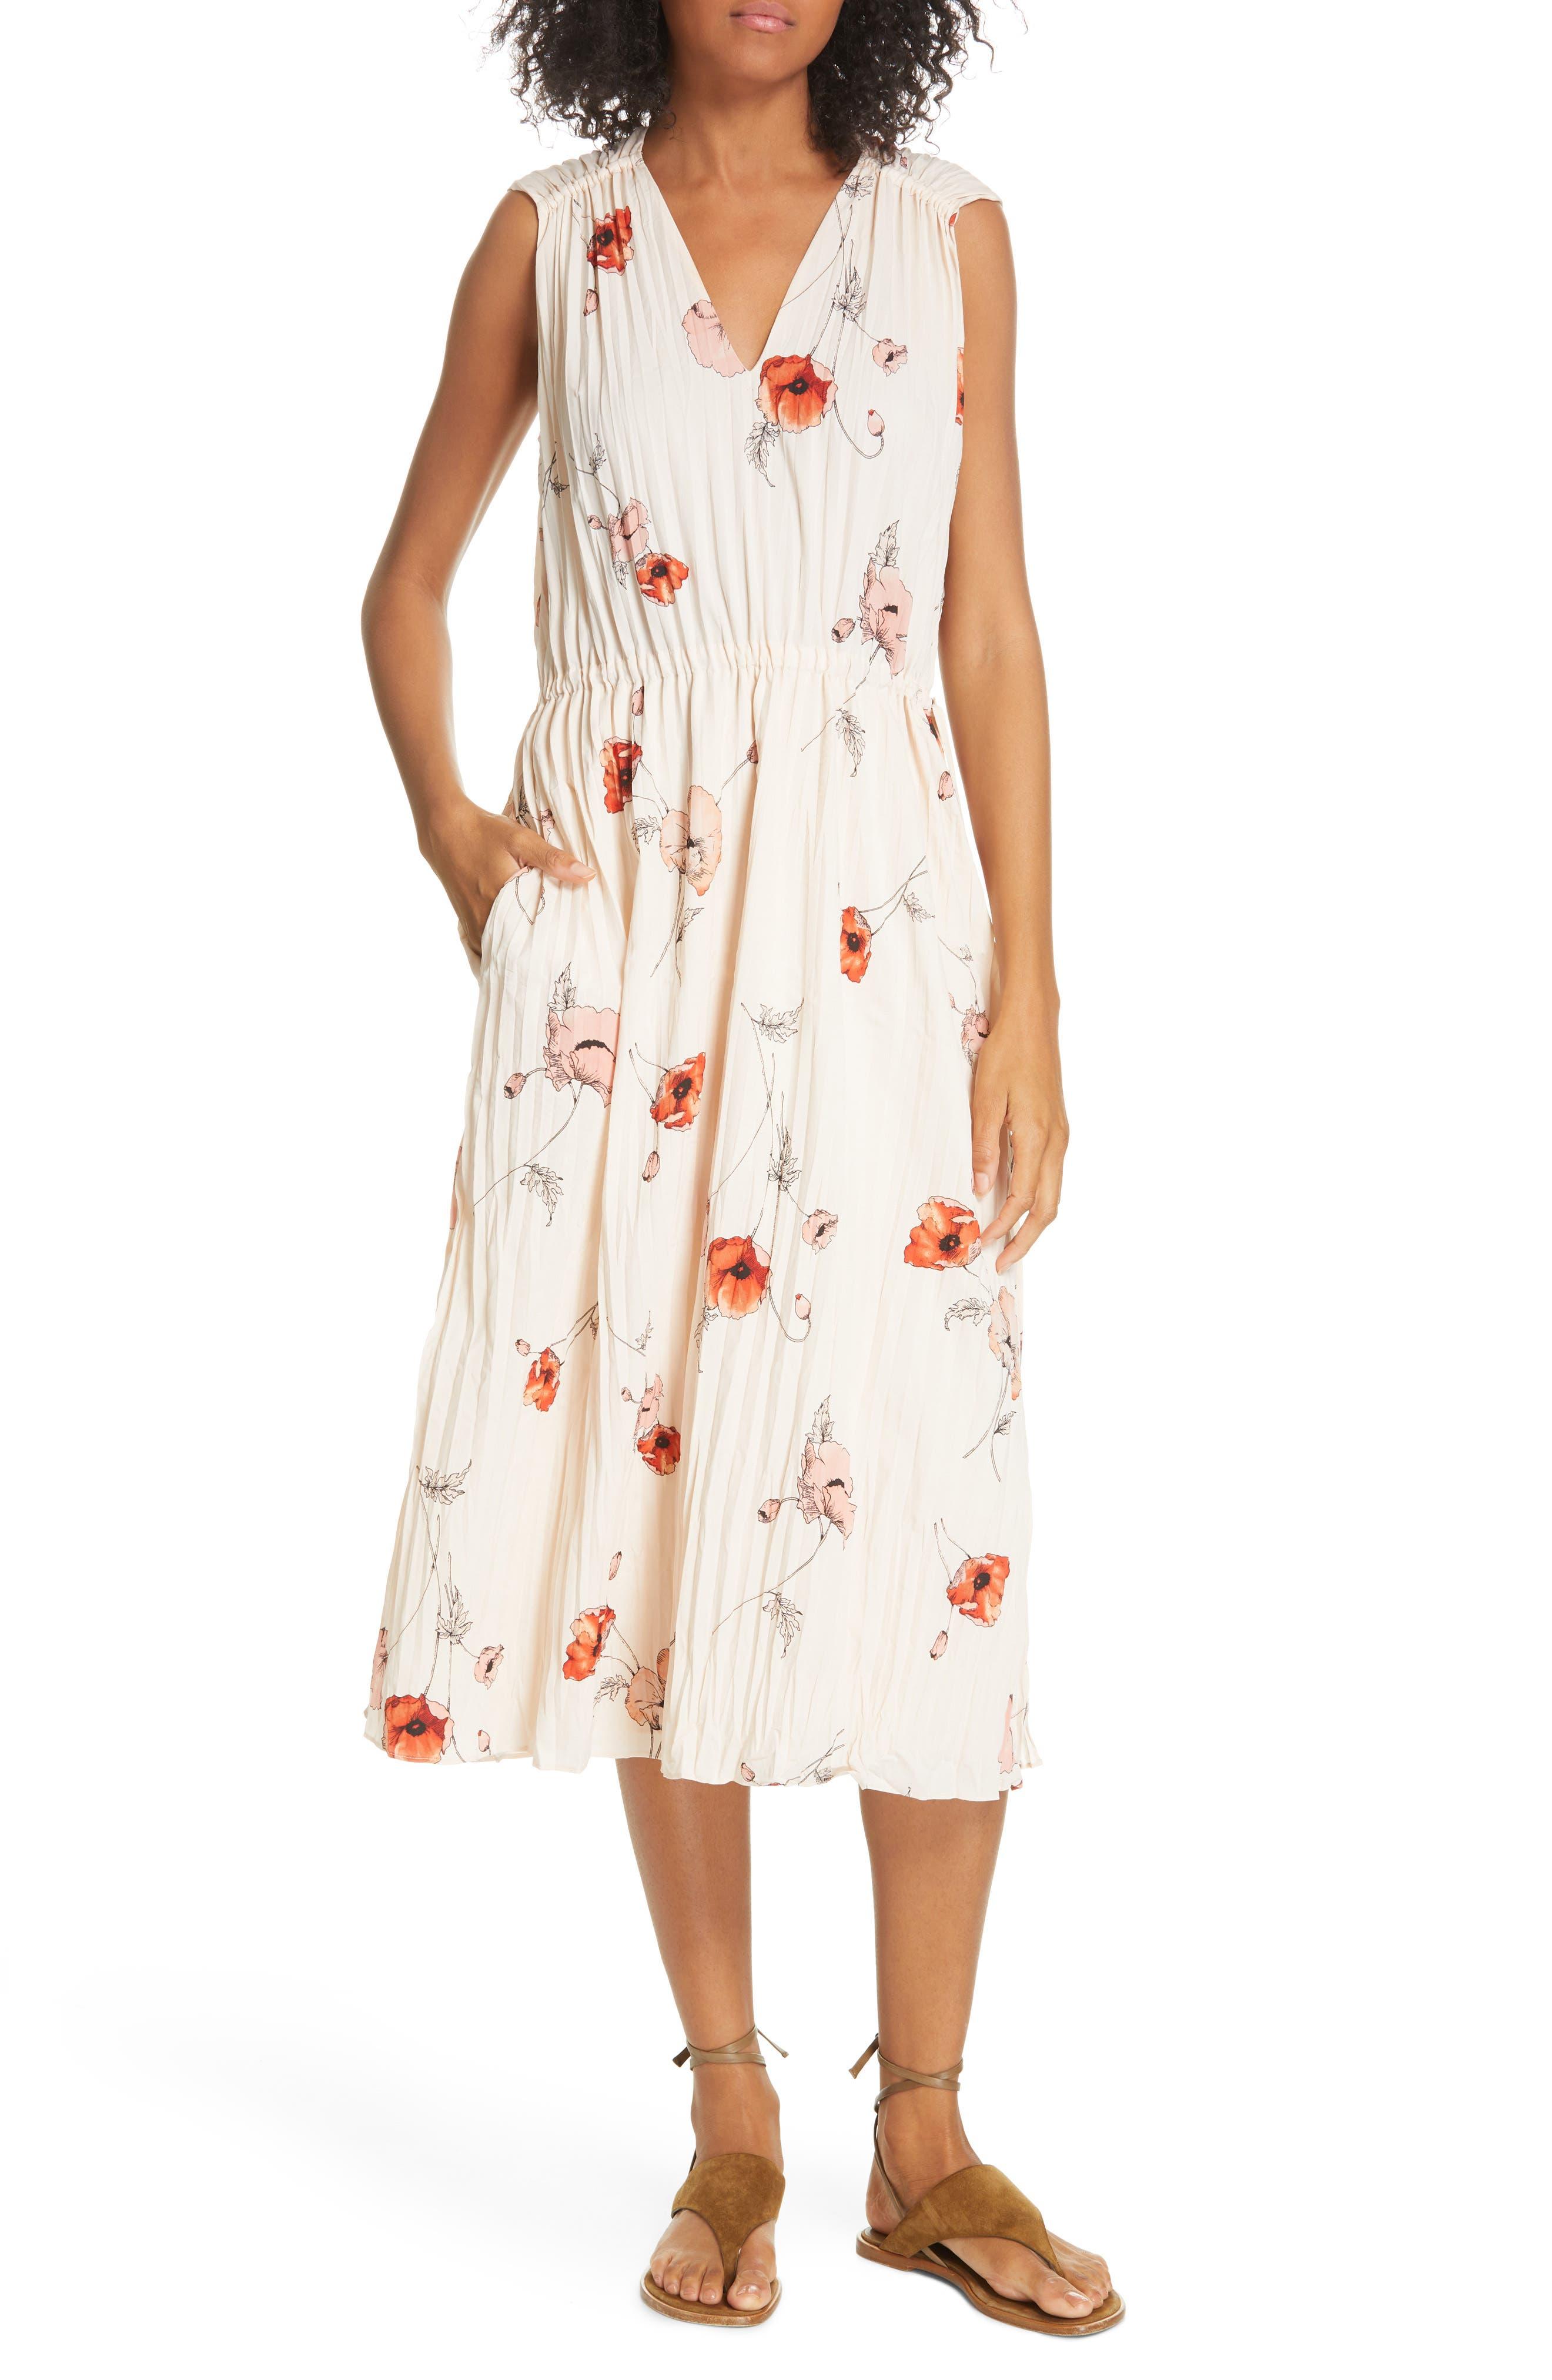 VINCE, Tossed Poppy Pleated Midi Dress, Main thumbnail 1, color, PALE BLUSH